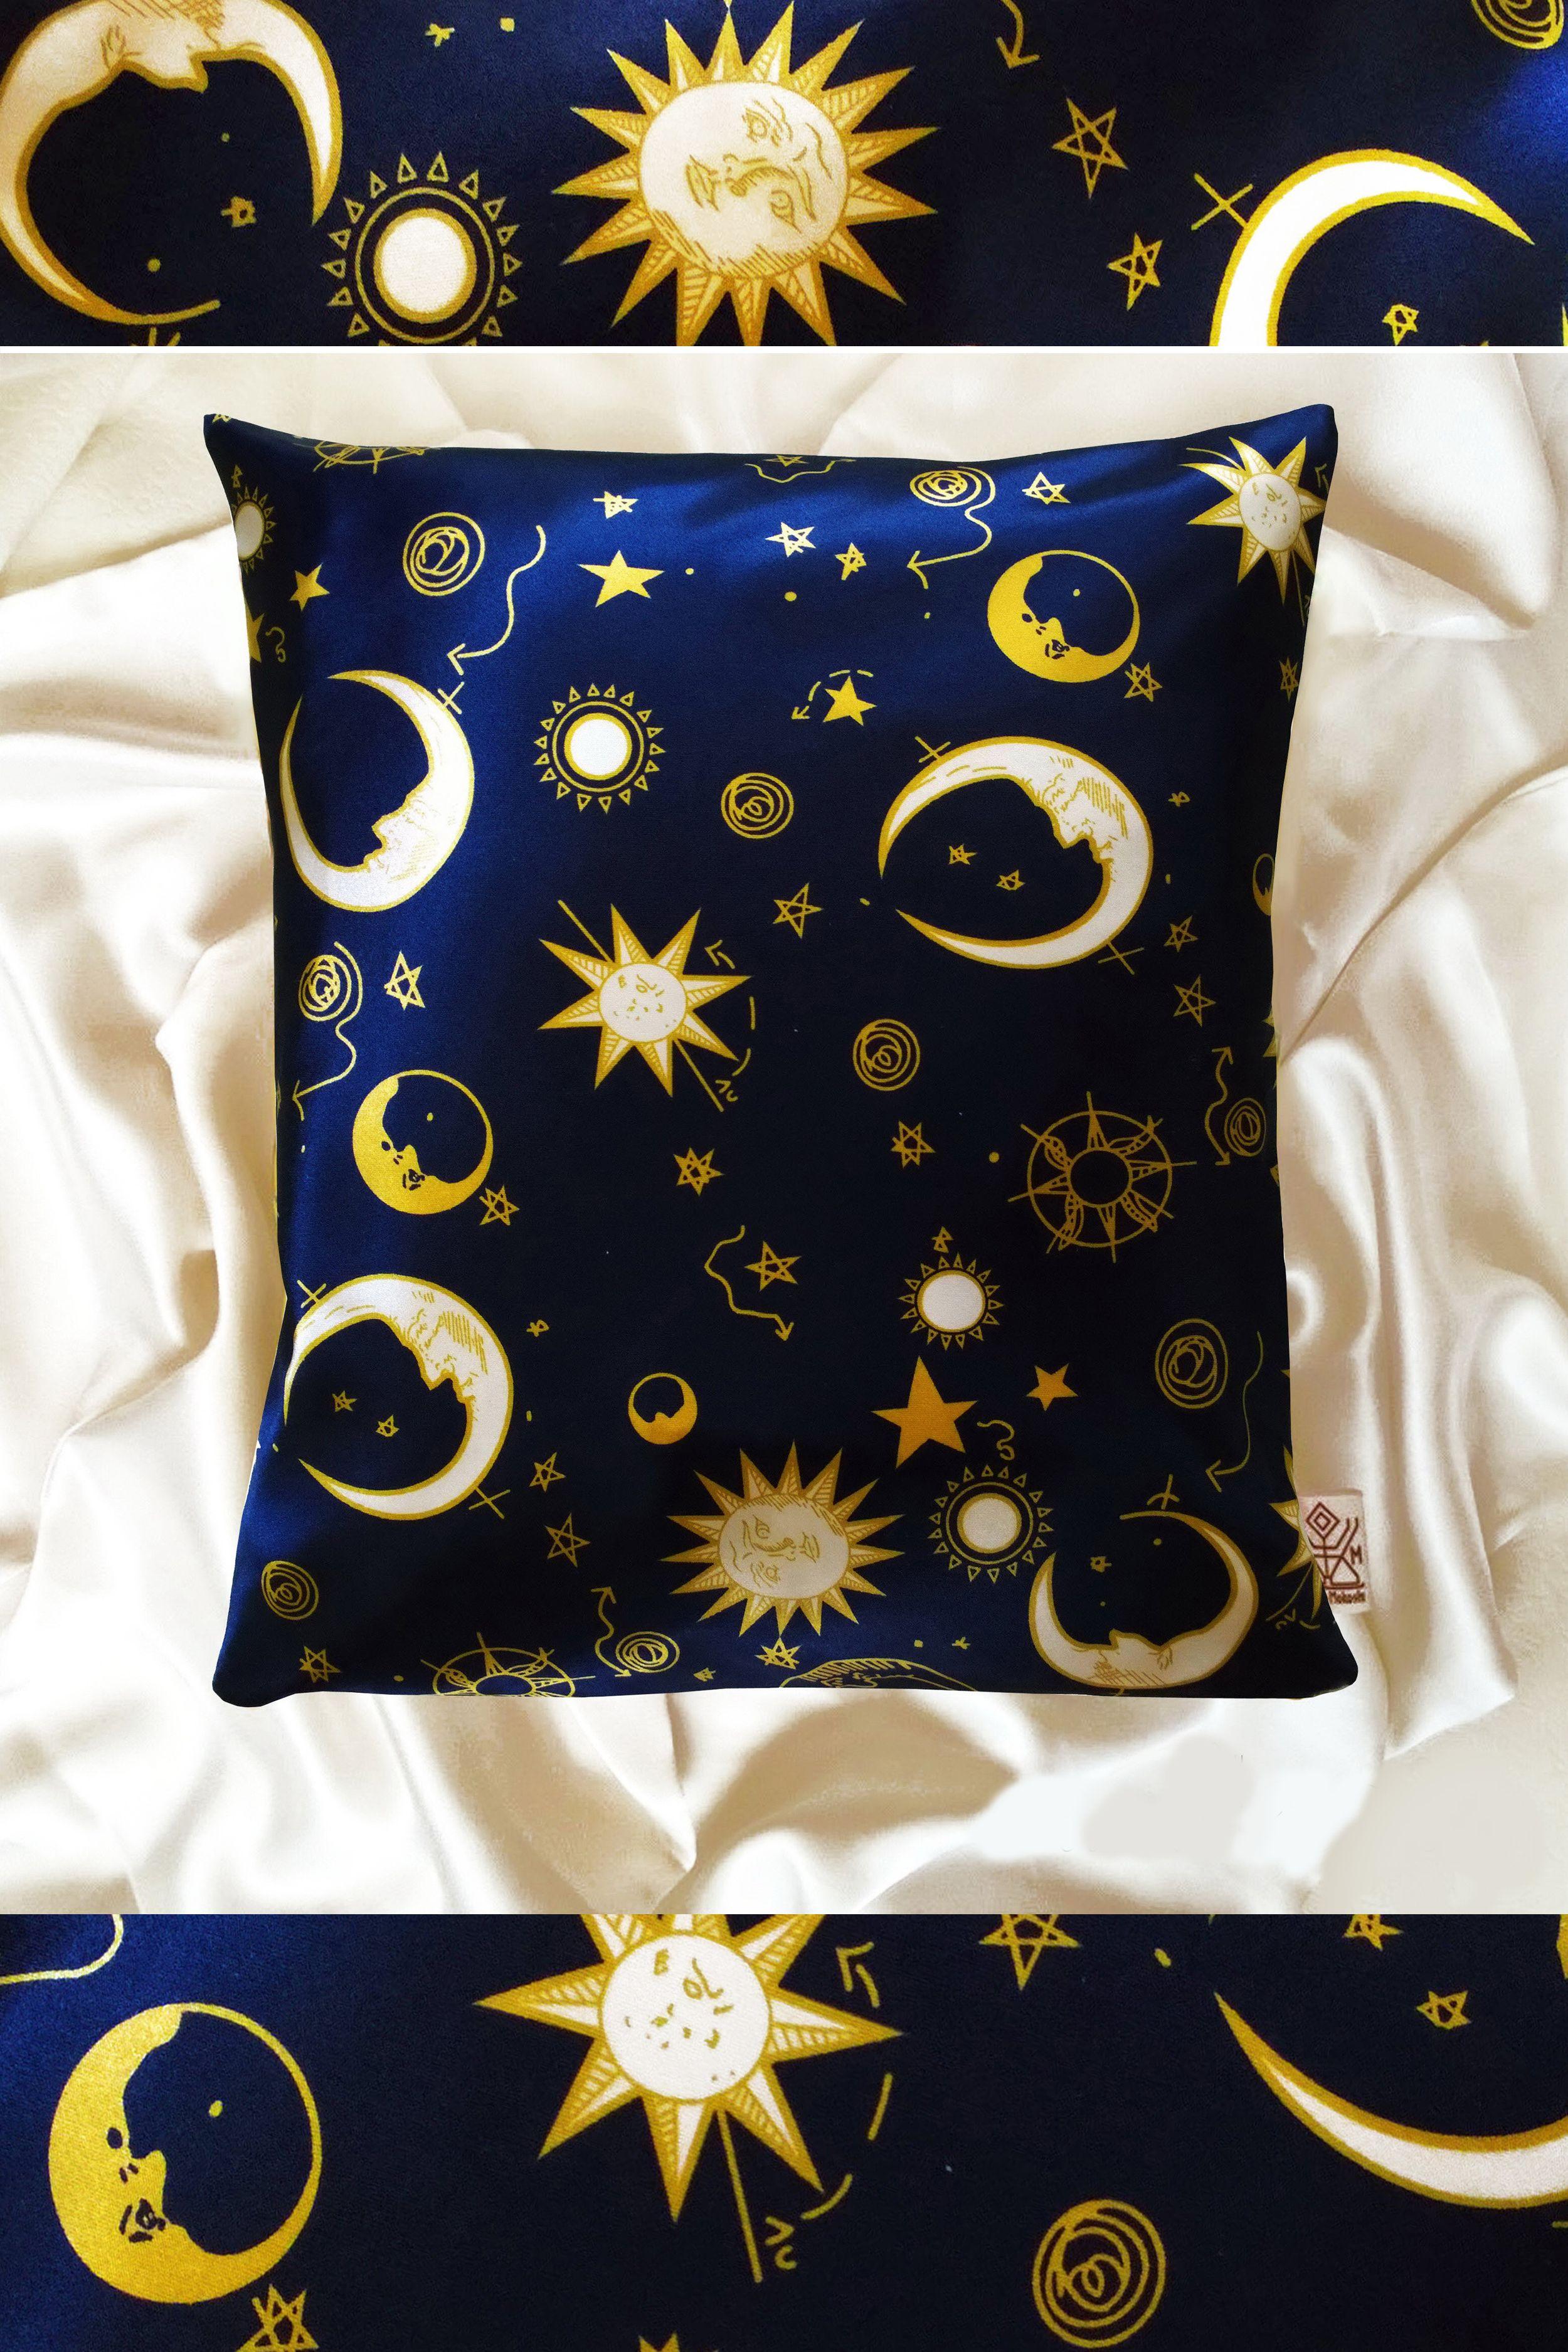 Stars And Moon Pillow Case Night Sky Pillow Blue Satin Cushion Etsy In 2021 Moon Pillow Blue Pillows Navy Blue Pillows